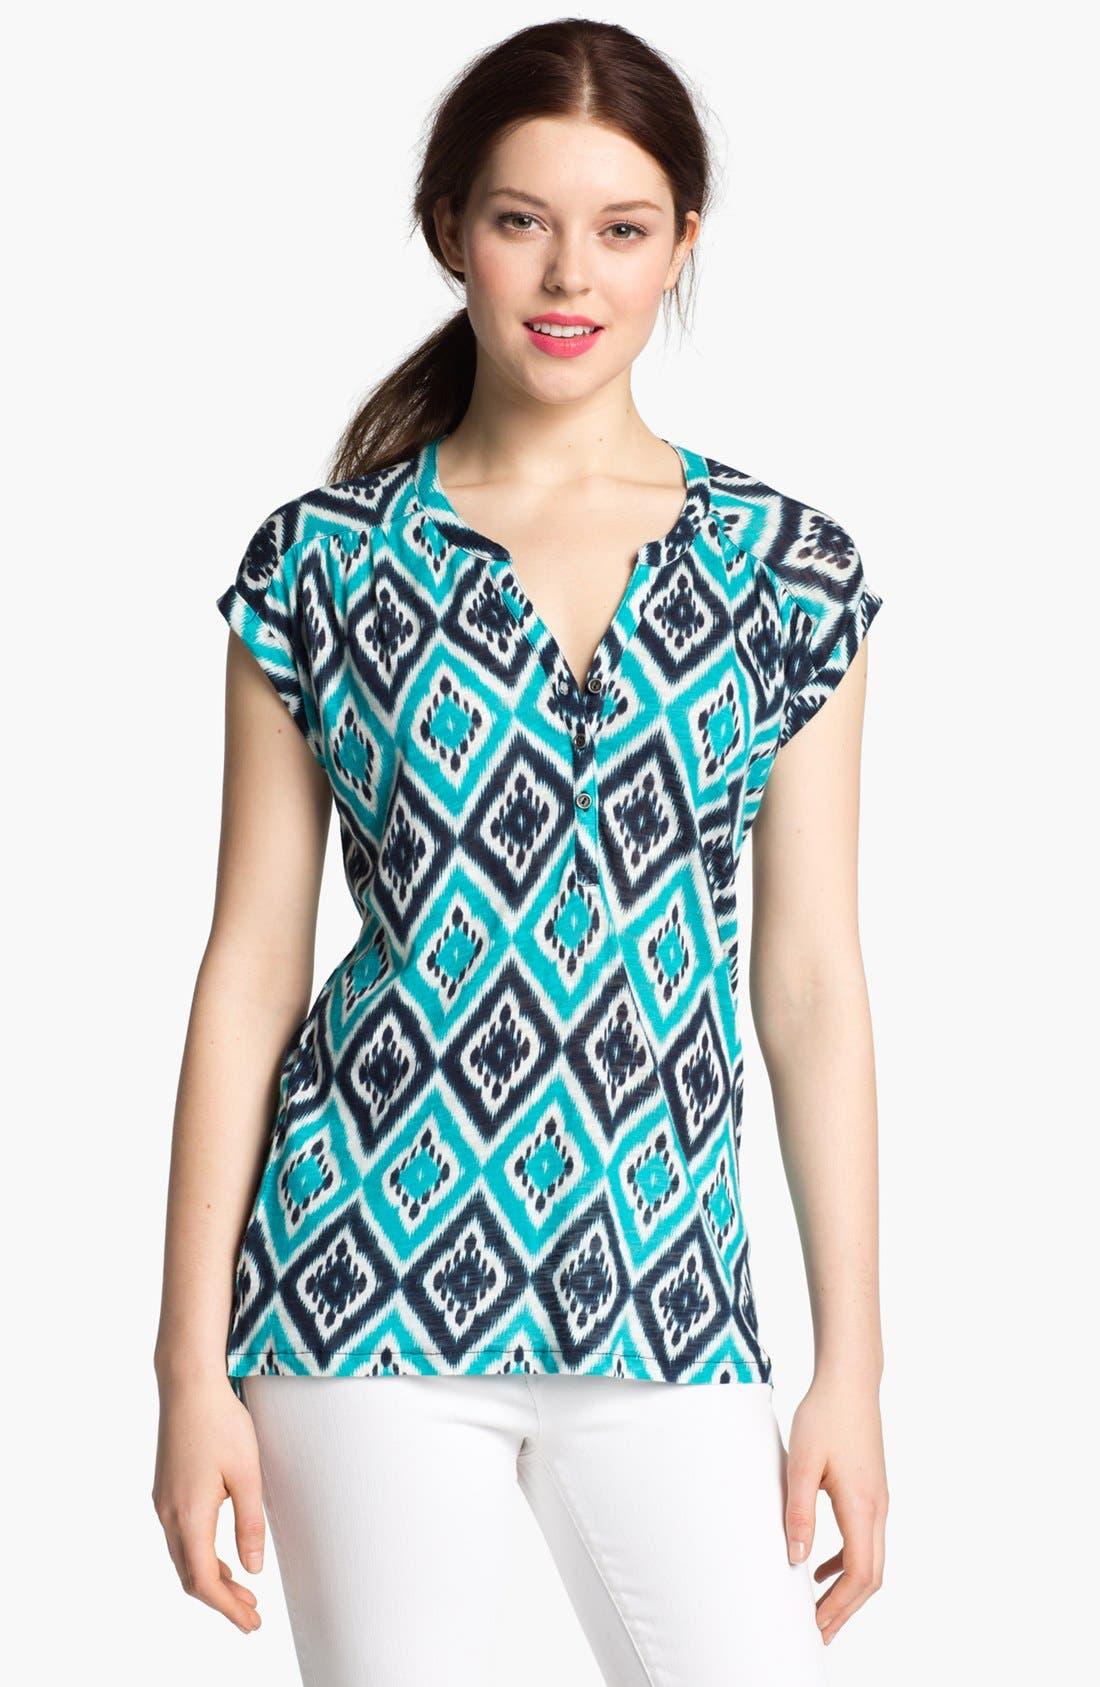 Main Image - Lucky Brand 'Ikat Diamond' Cotton Top